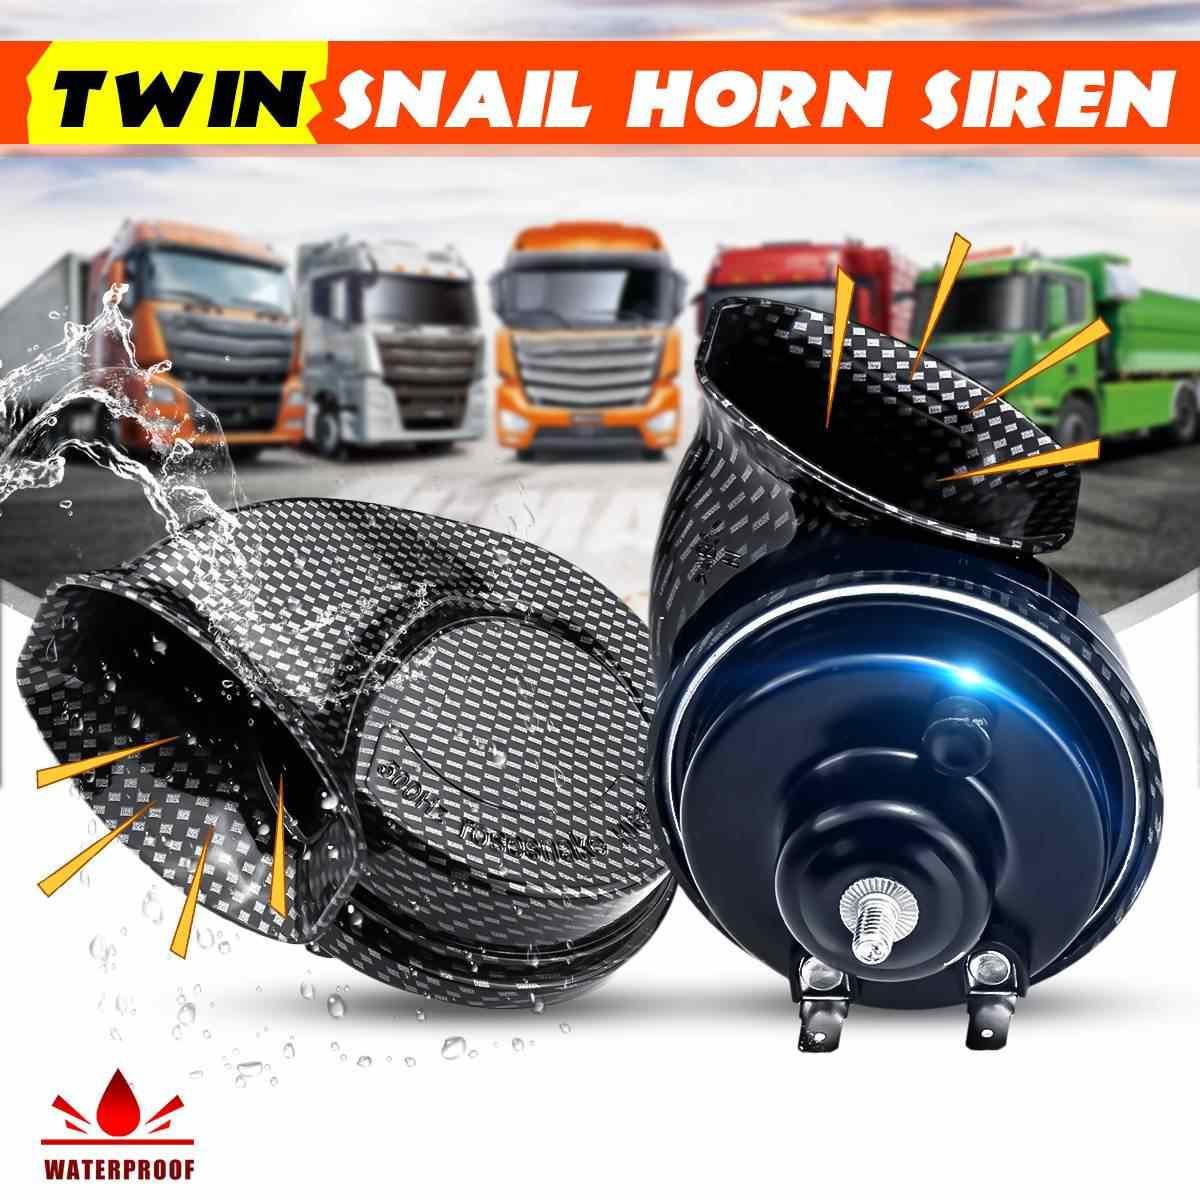 Partol Snail Horn Electric Snail Air Horn Siren Car Truck Horn 12V 110DB Loud Dual-Tone Universal for Cars Vehicle Truck Motorcycle Boat 1 Pair